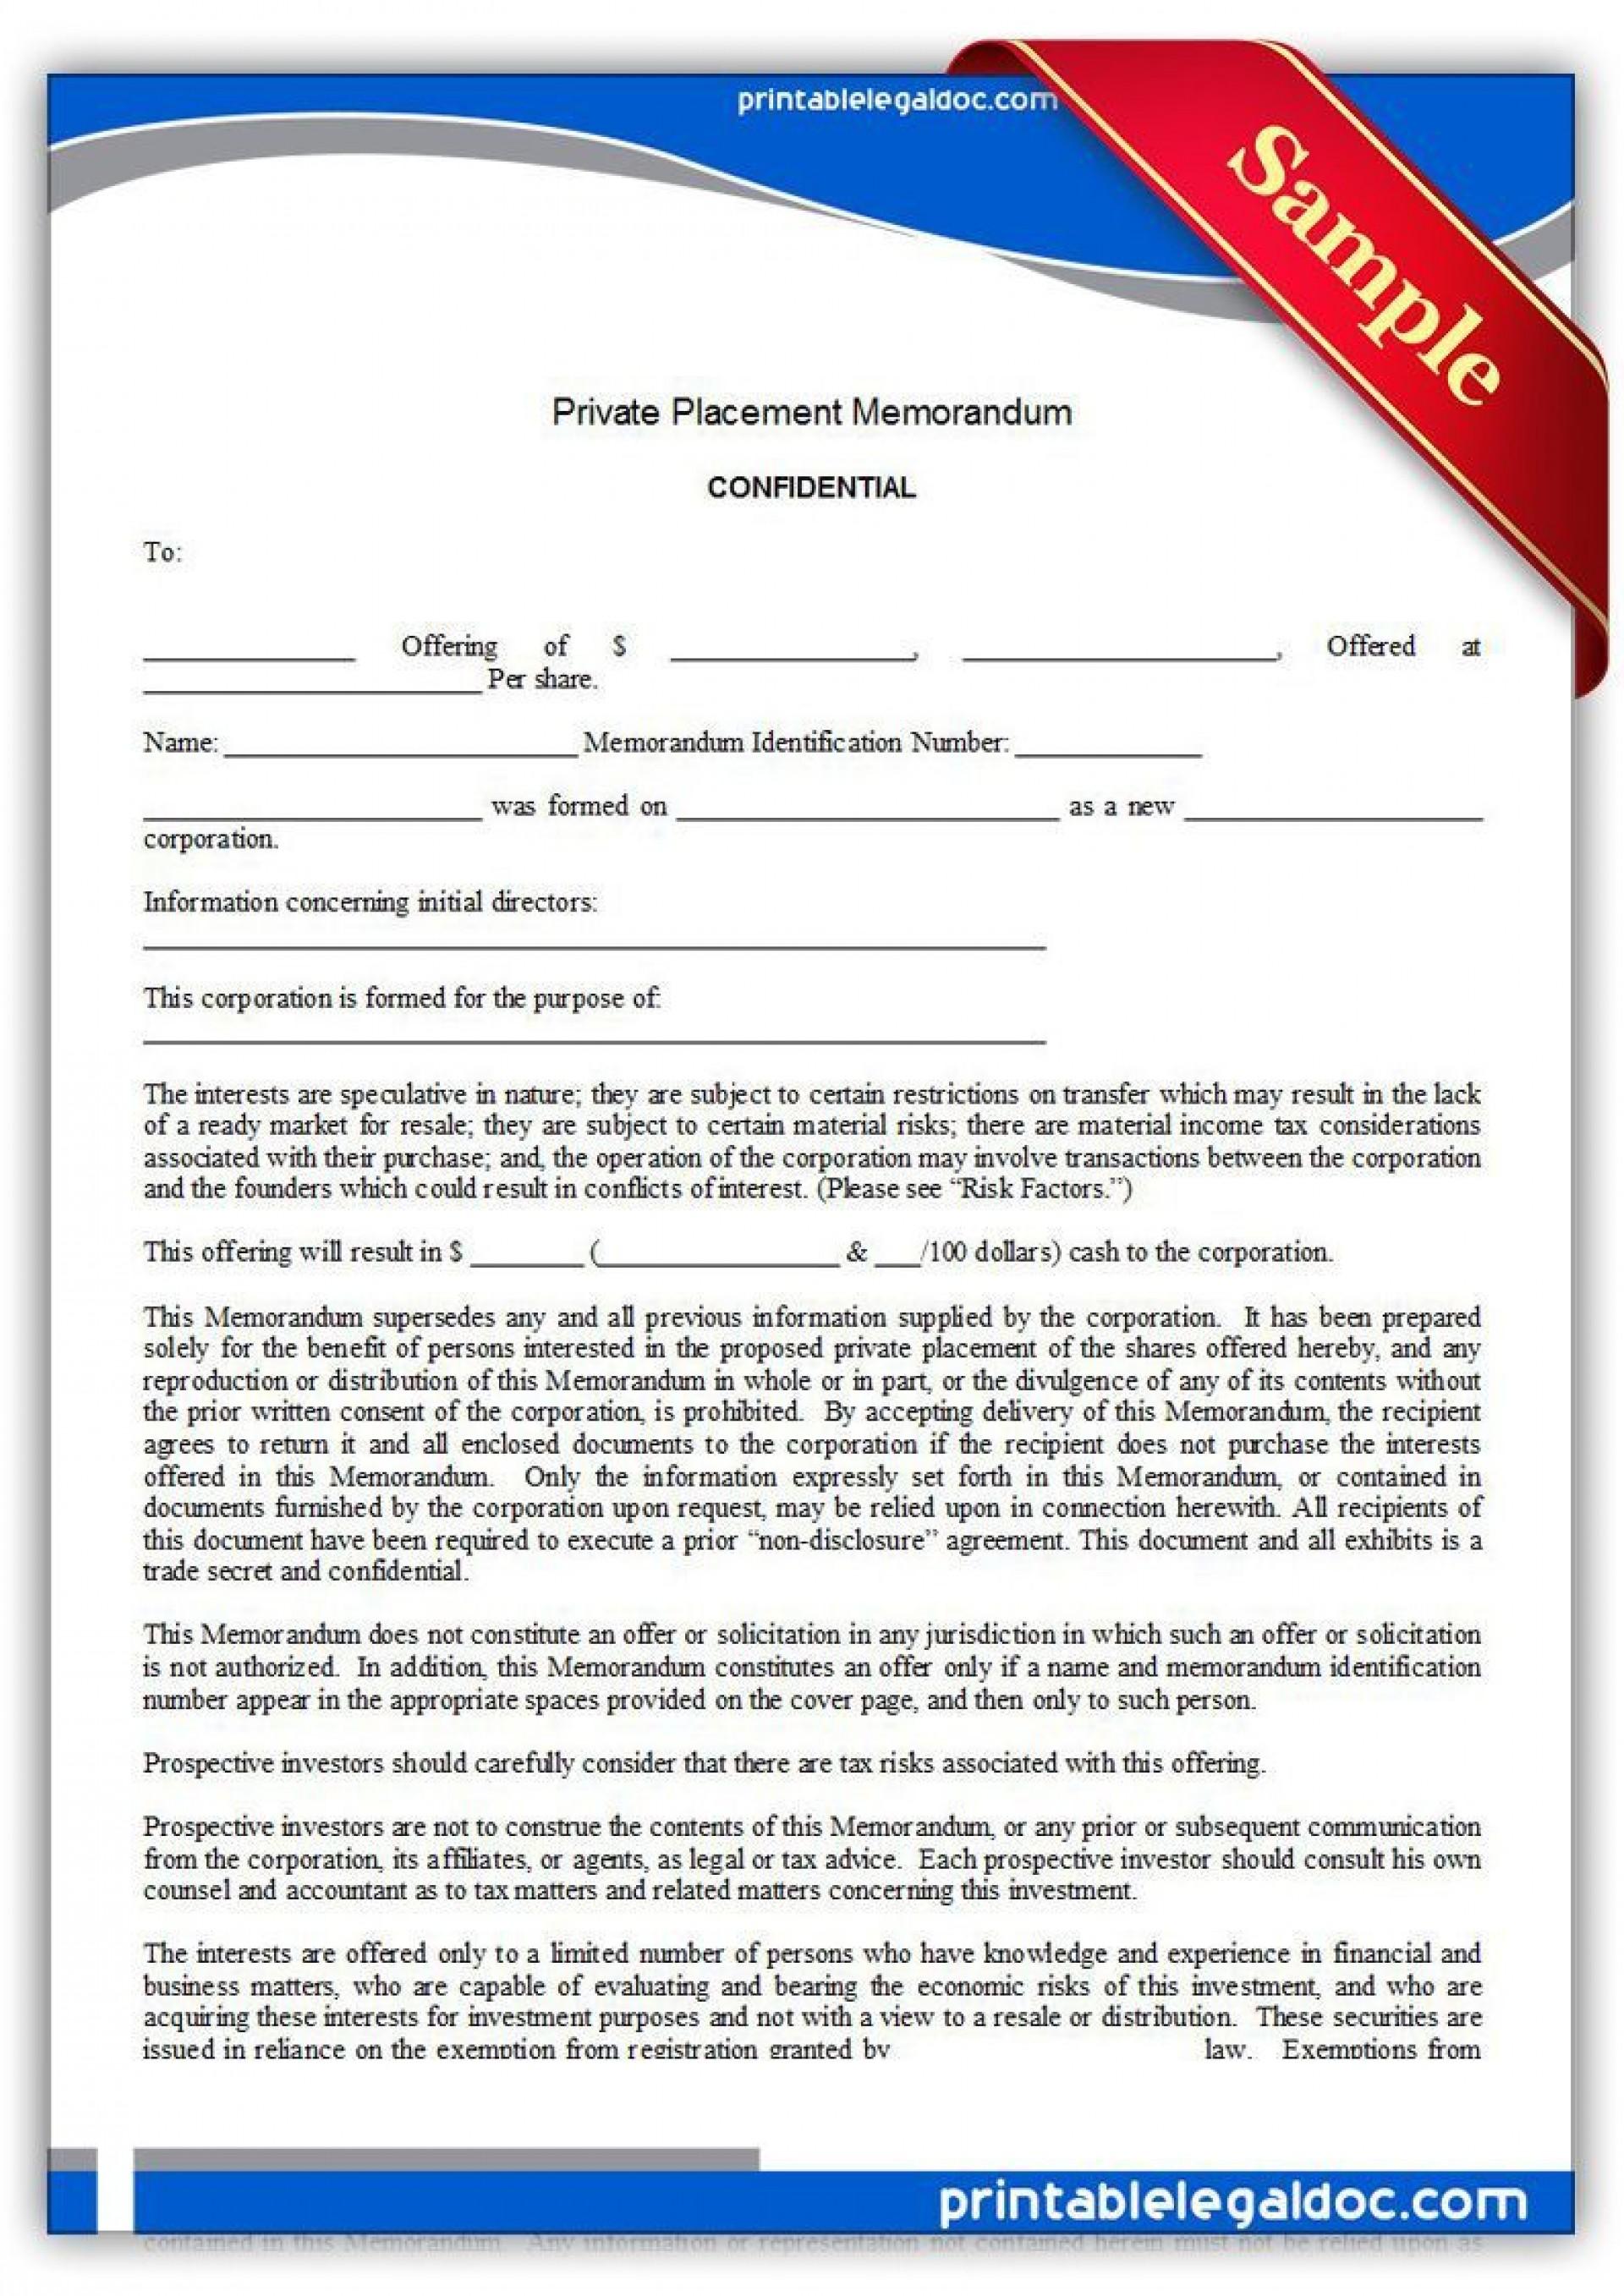 000 Incredible Private Placement Memorandum Template Doc Highest Clarity 1920